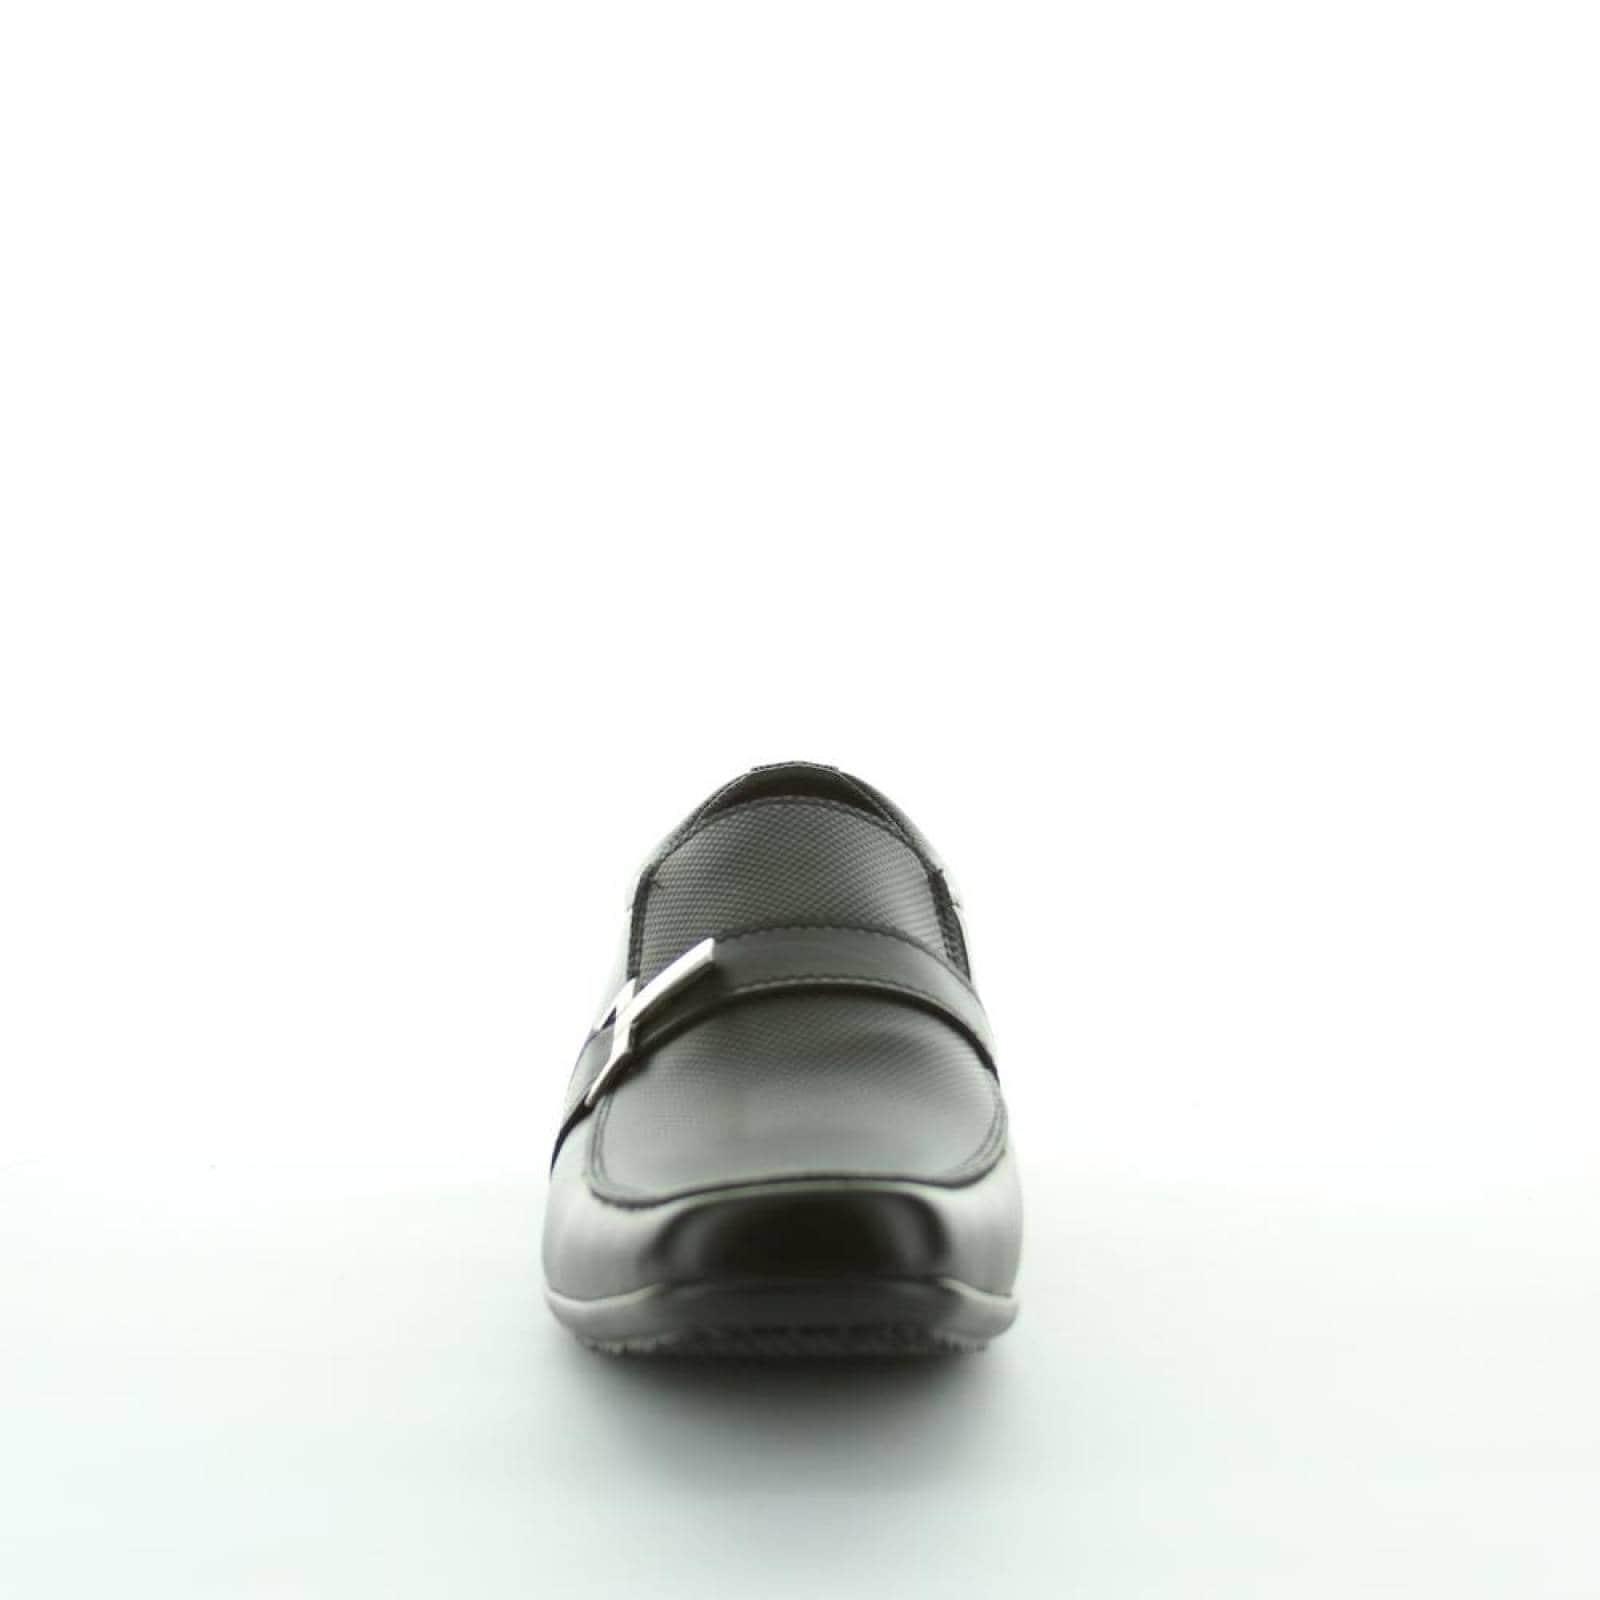 Zapato Cerrado Signos Hombre Negro Tipo Napa 6025 14